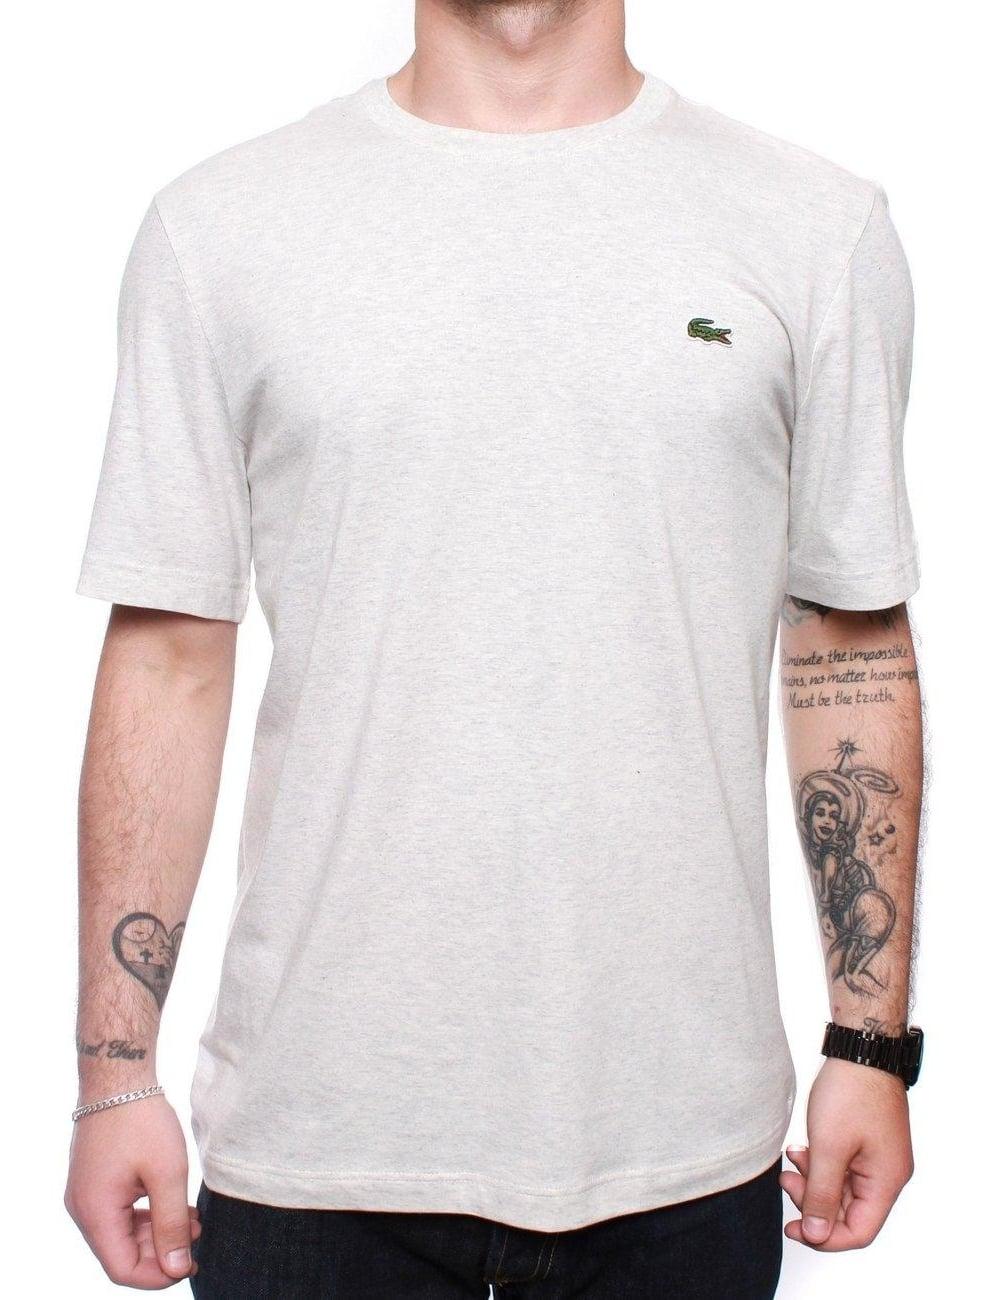 Fat Uk Store Buddha Clothing Lacoste Live Shirt Pigeon T From Logo SHnz0wqvzB